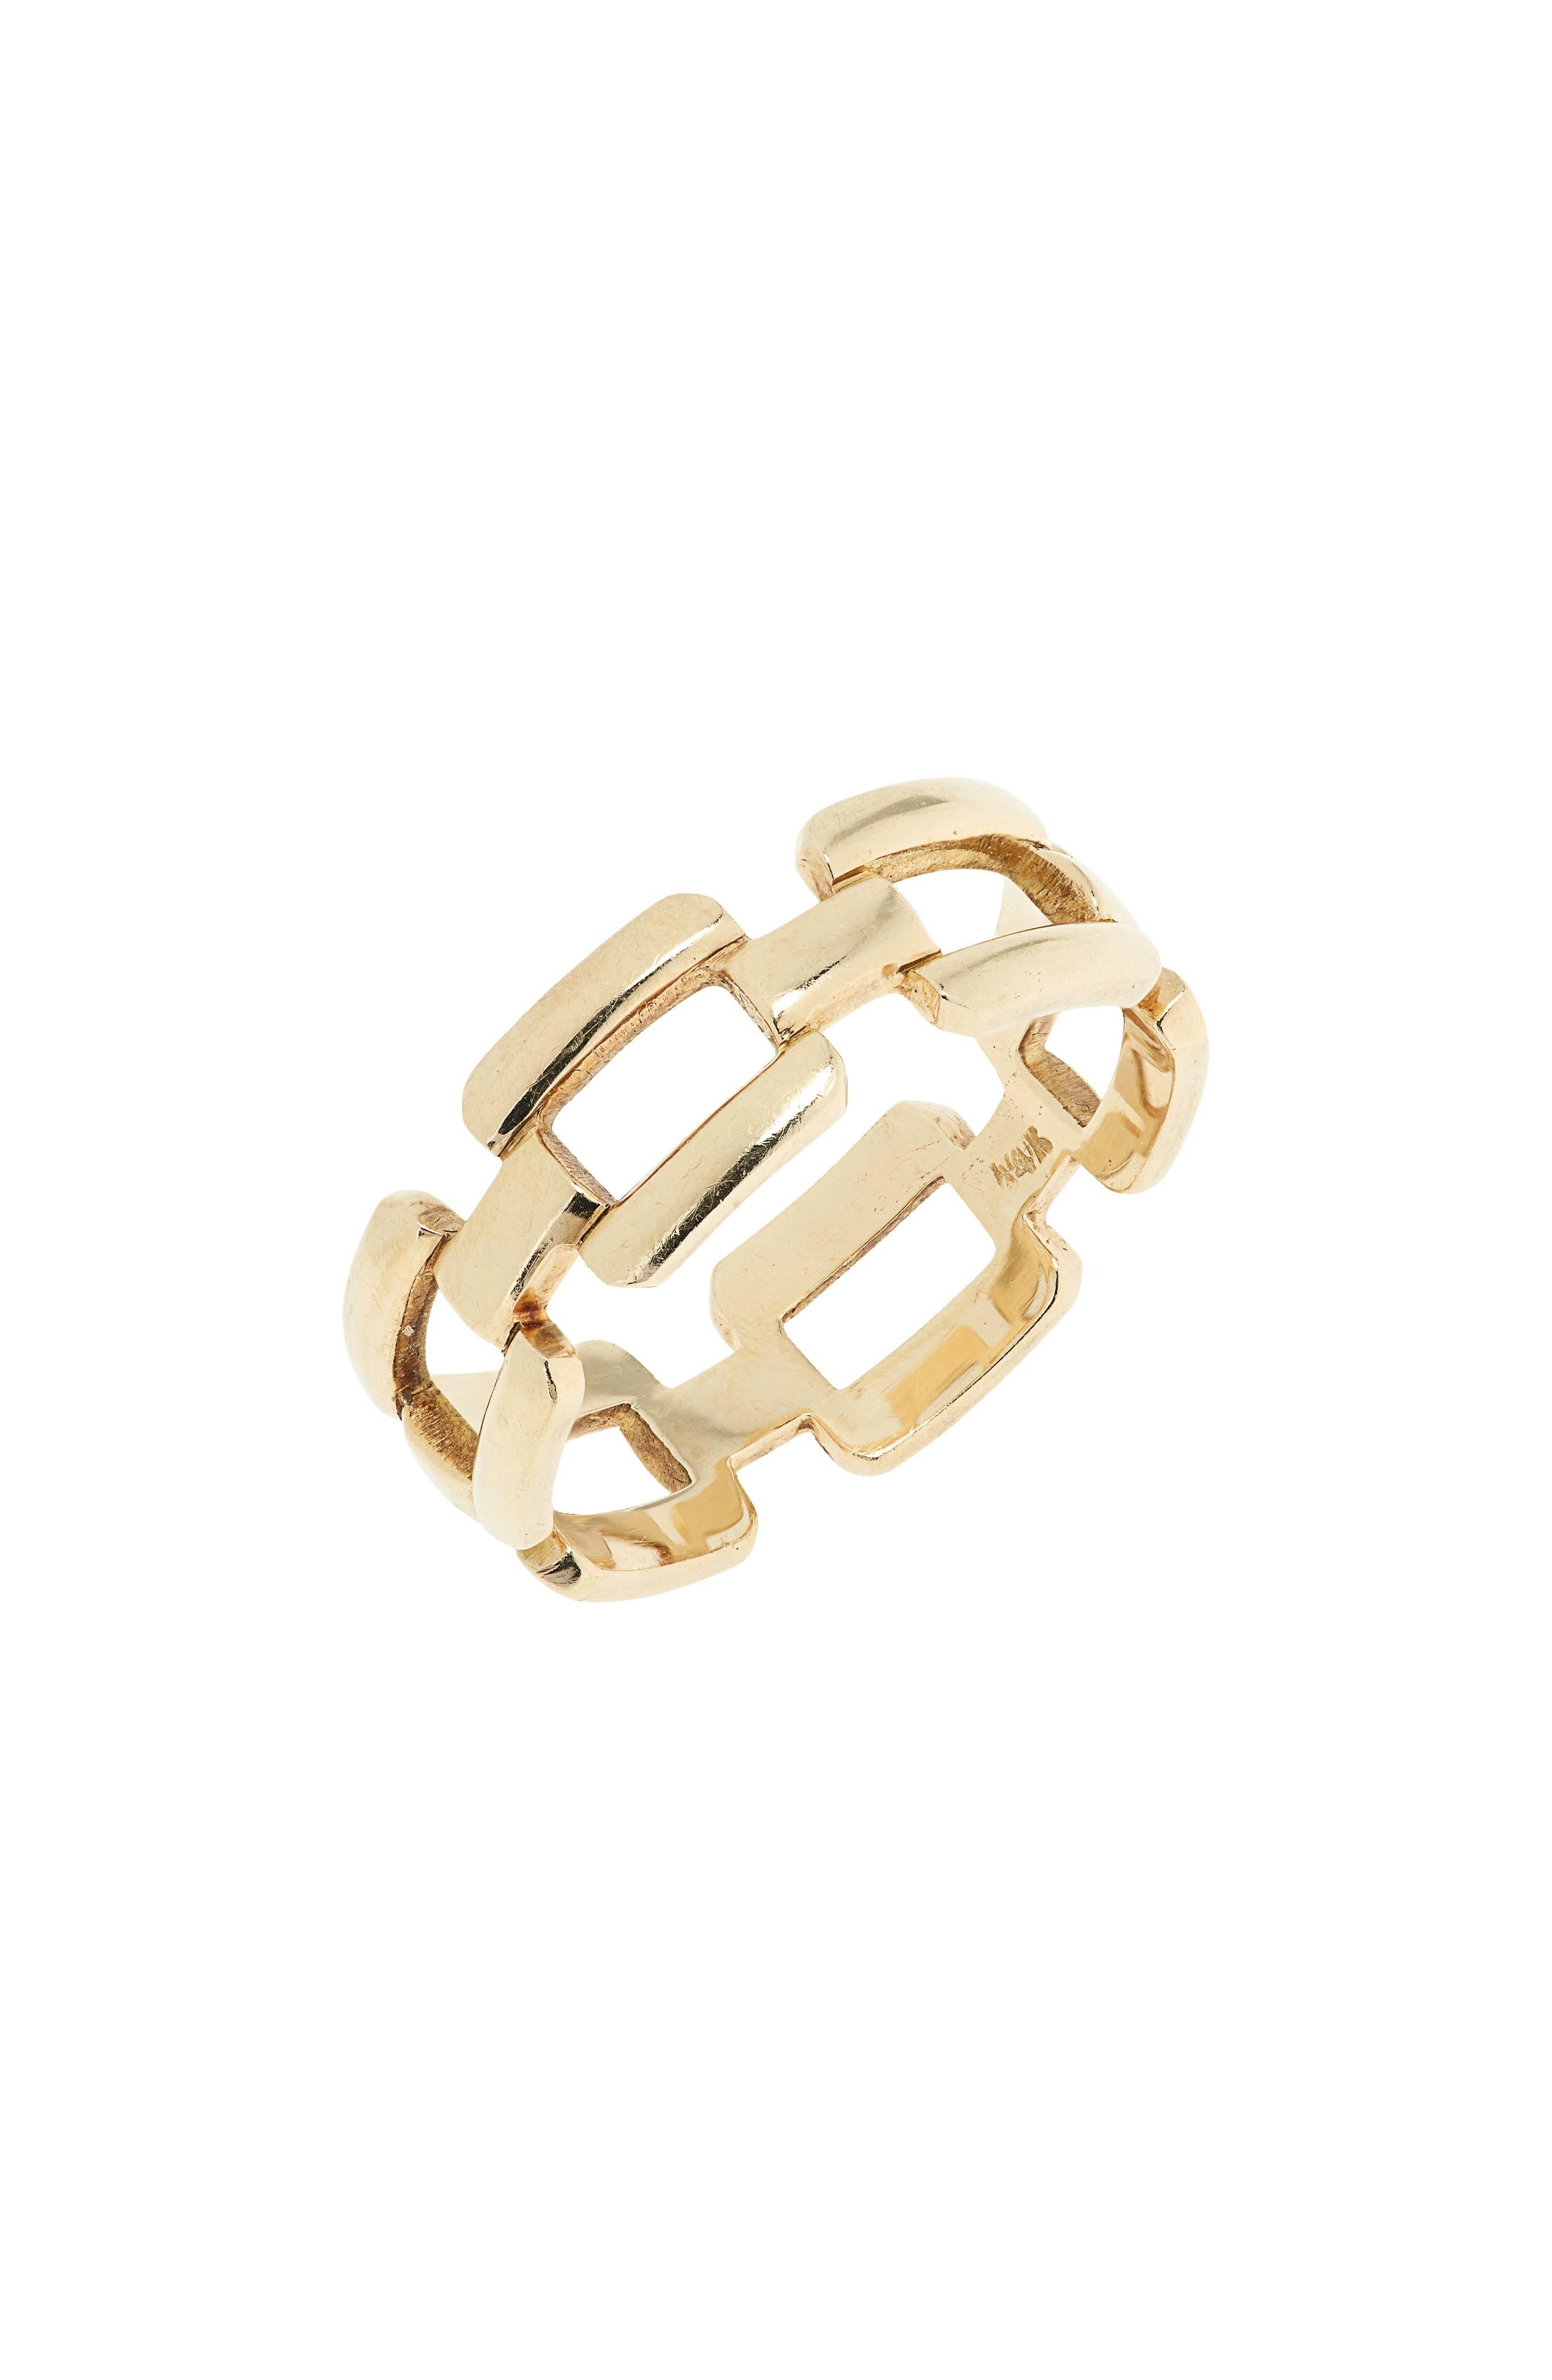 Originals Signature Link 14K Gold Ring